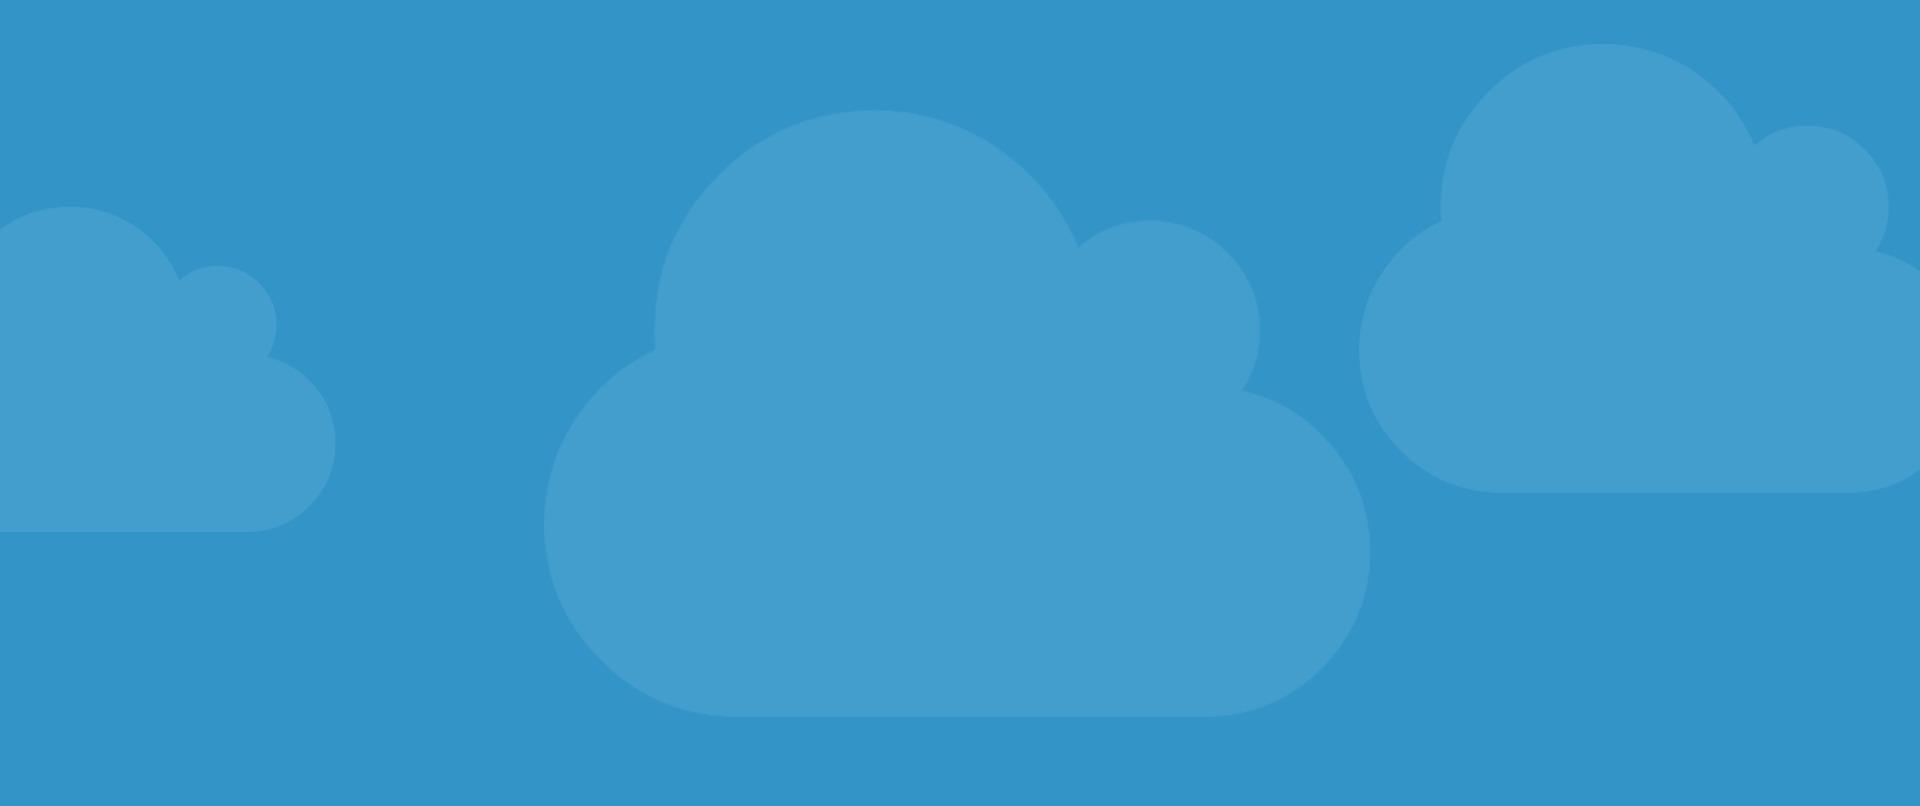 cloud background - cloud-background